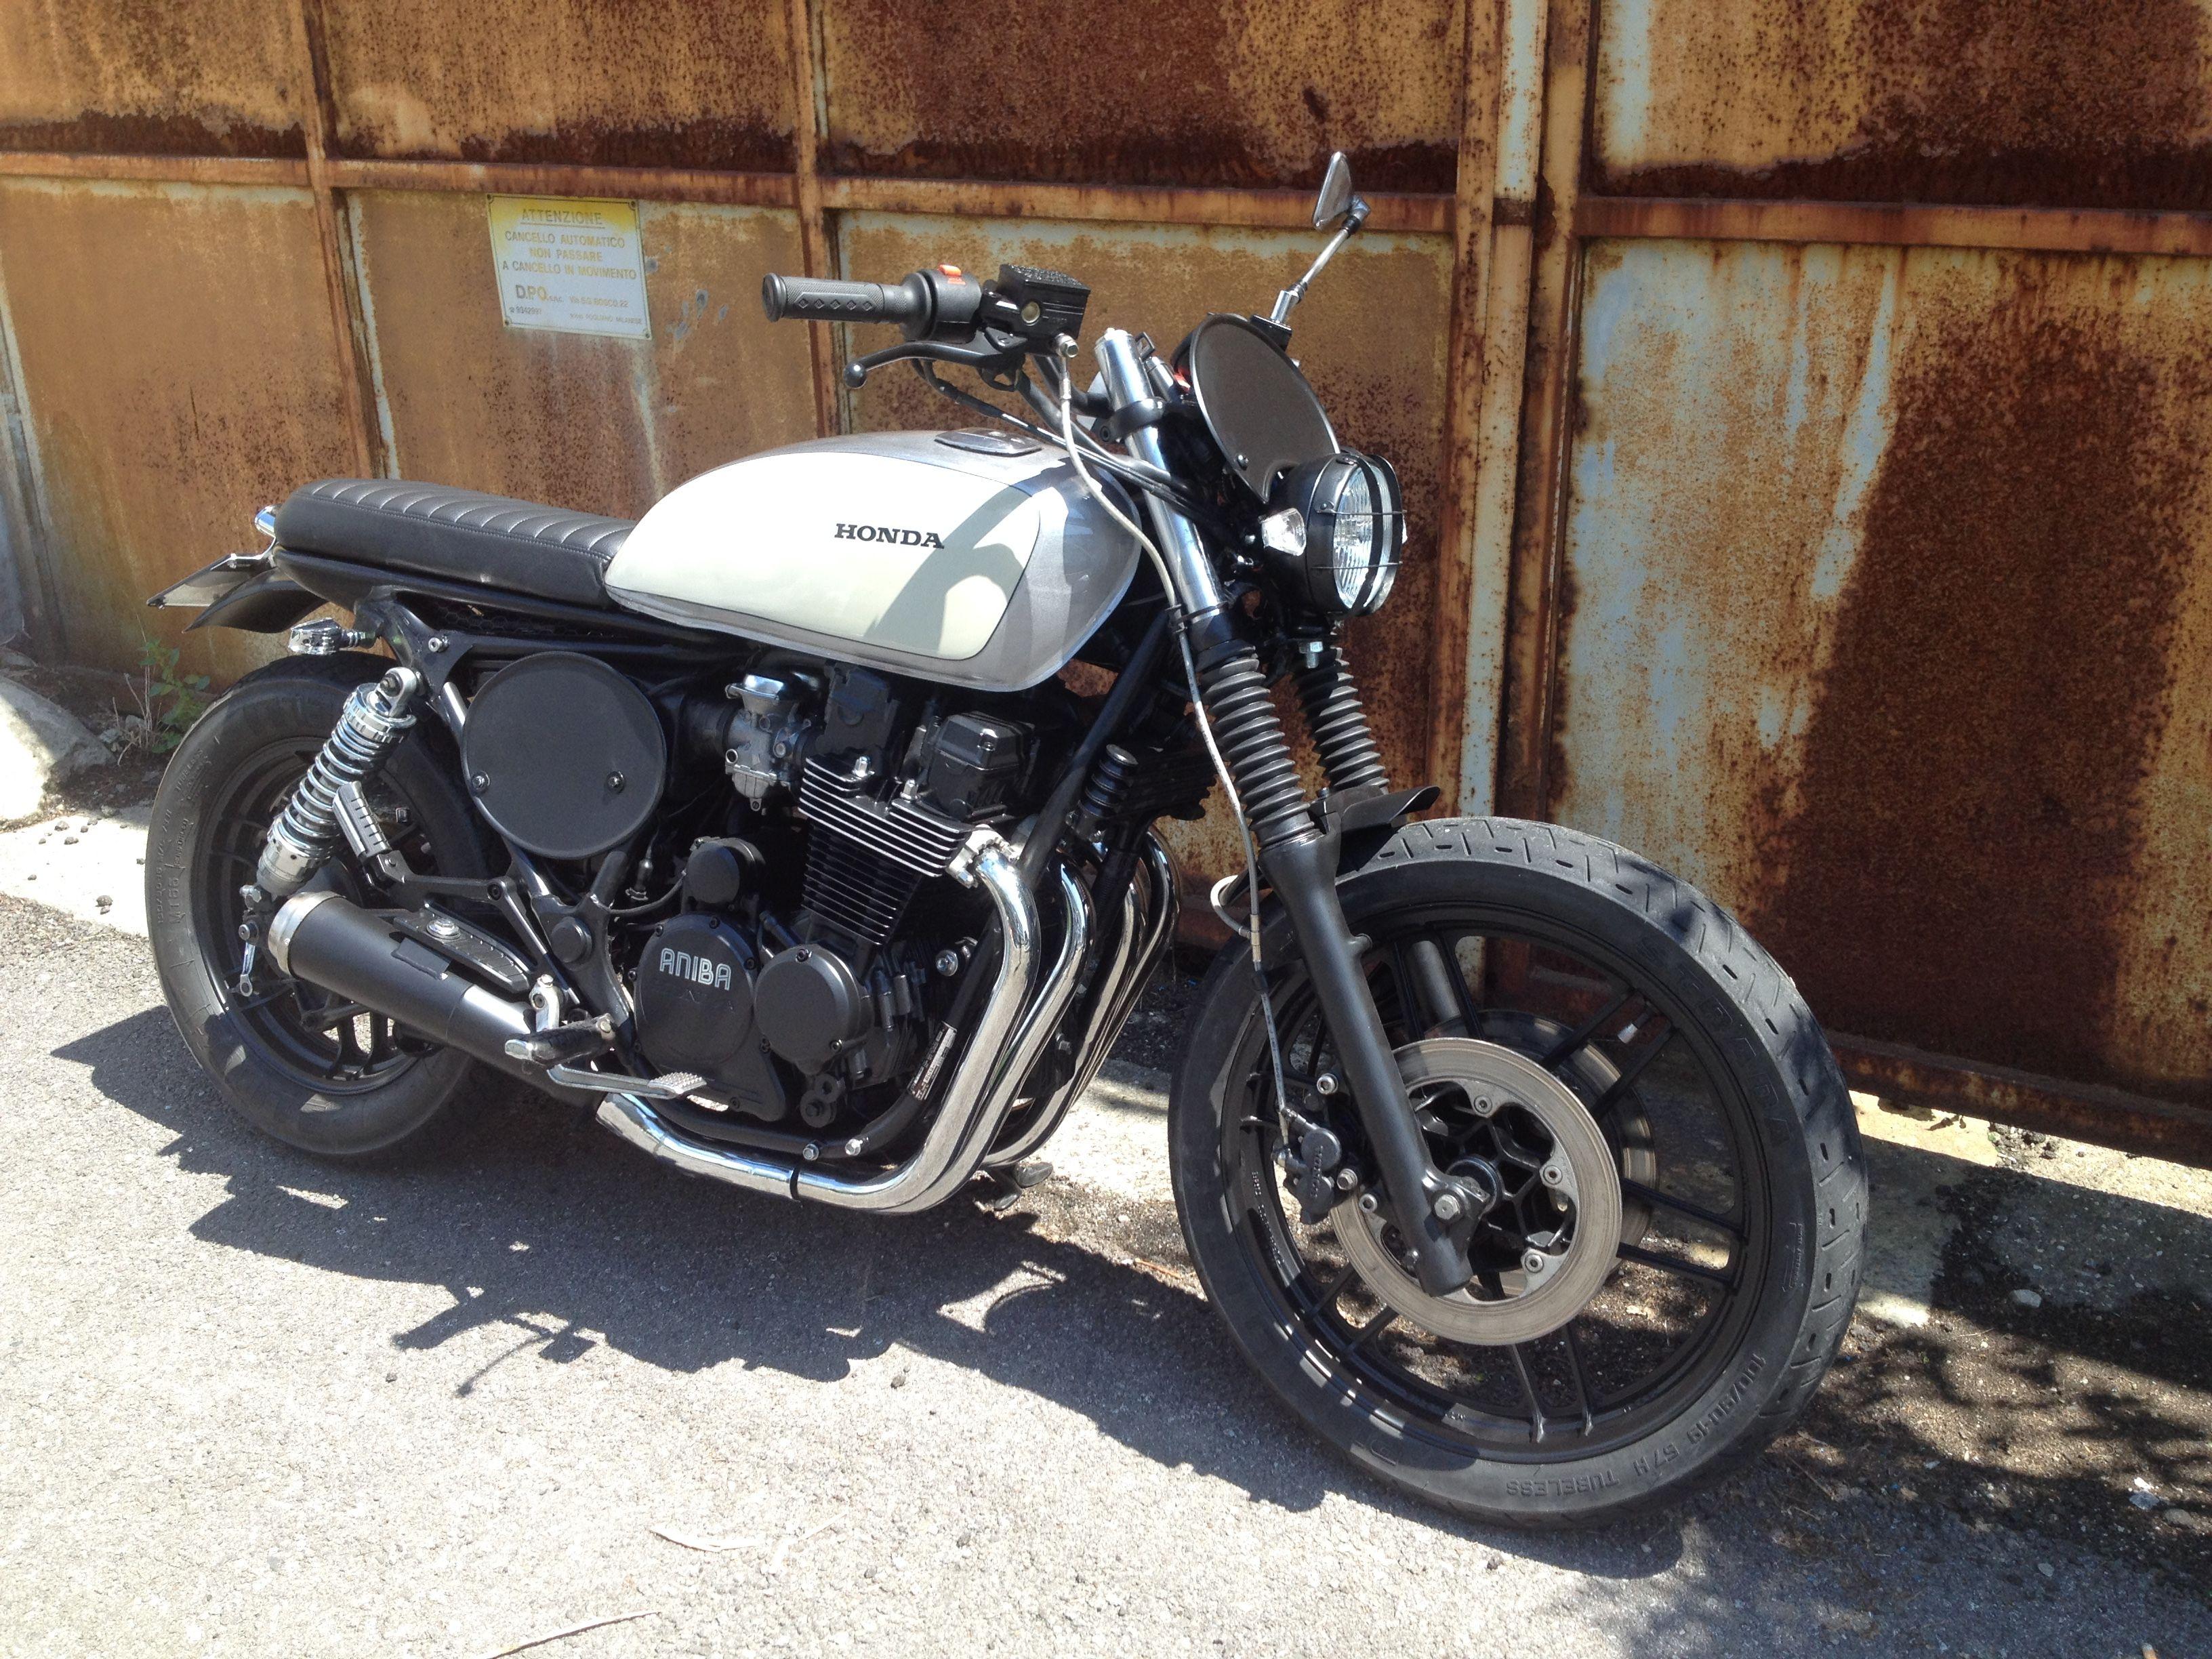 honda cb 650 sc nighthawkaniba motorcycles   cafe brat bobber